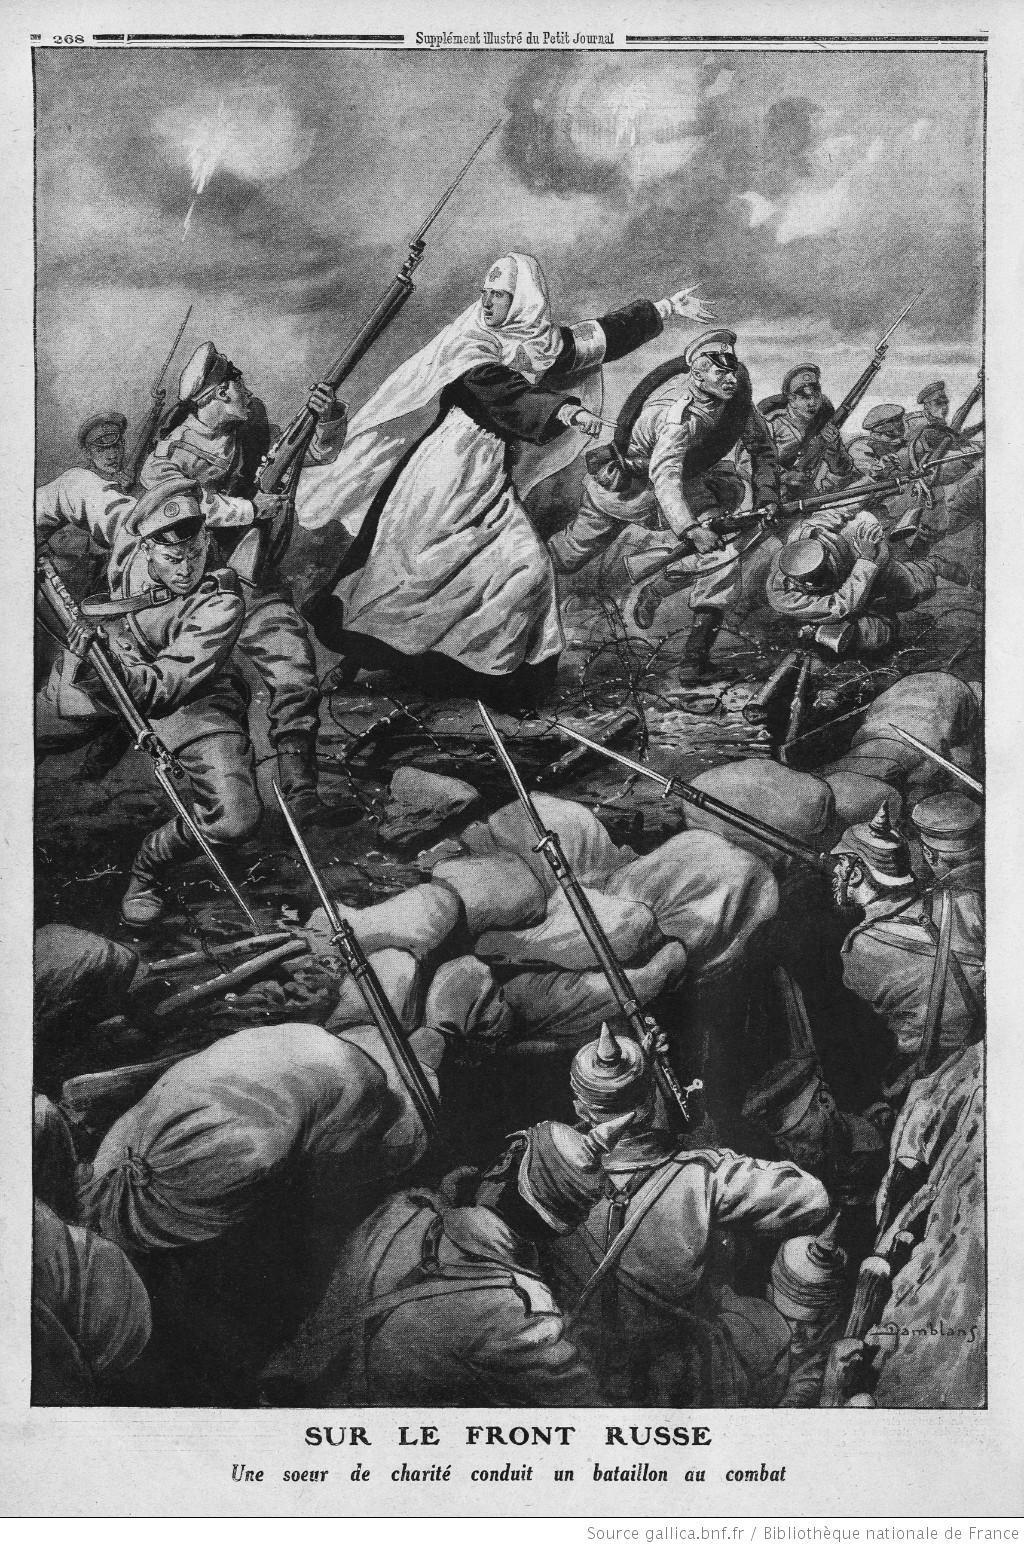 LPJ Illustre 1915-10-17 B.jpg